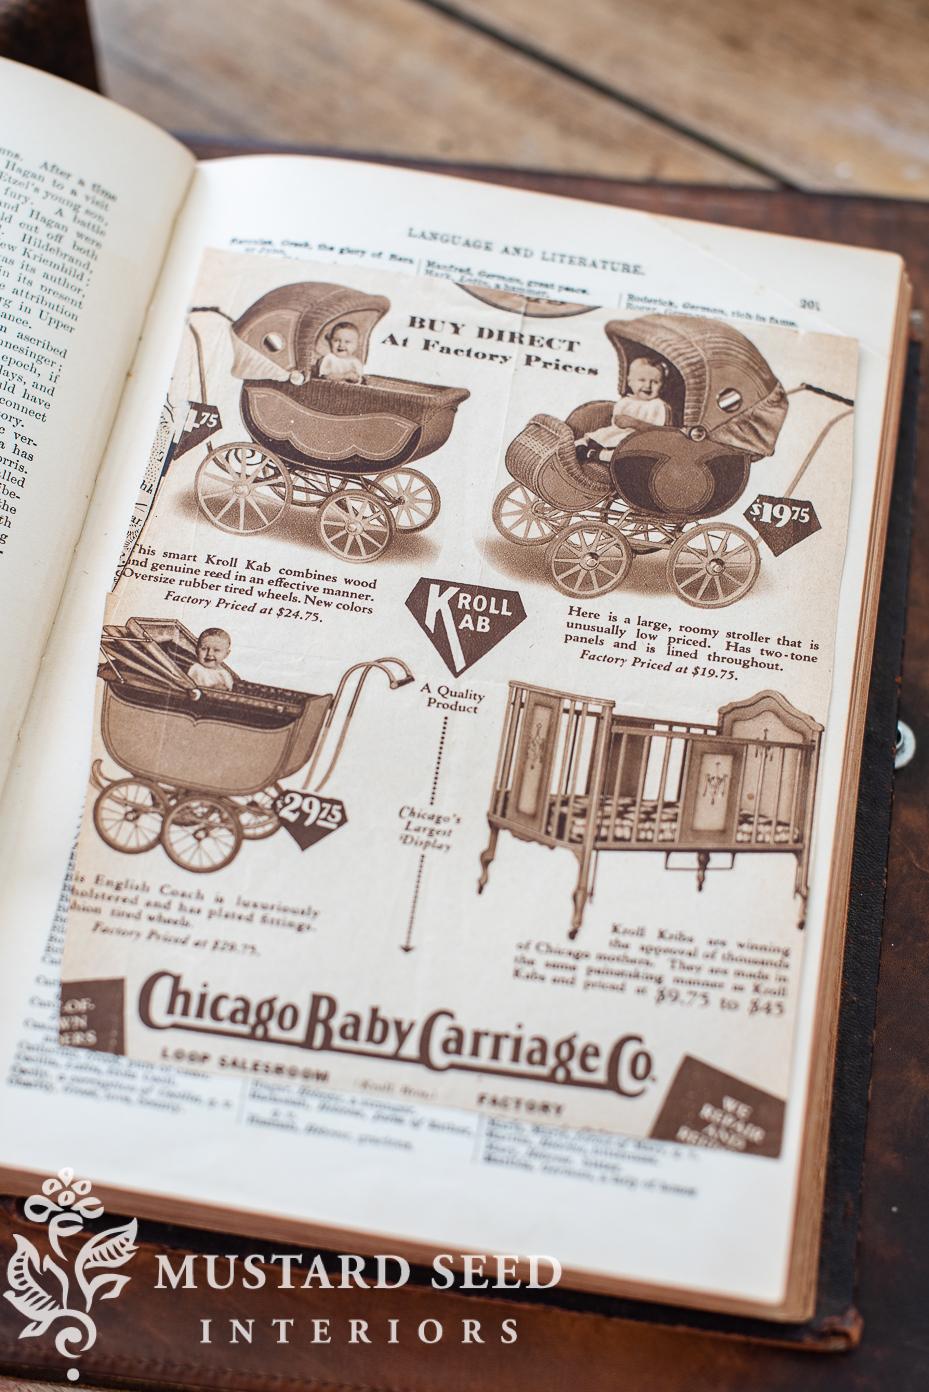 gold rush finds | antique pram advertisement | miss mustard seed